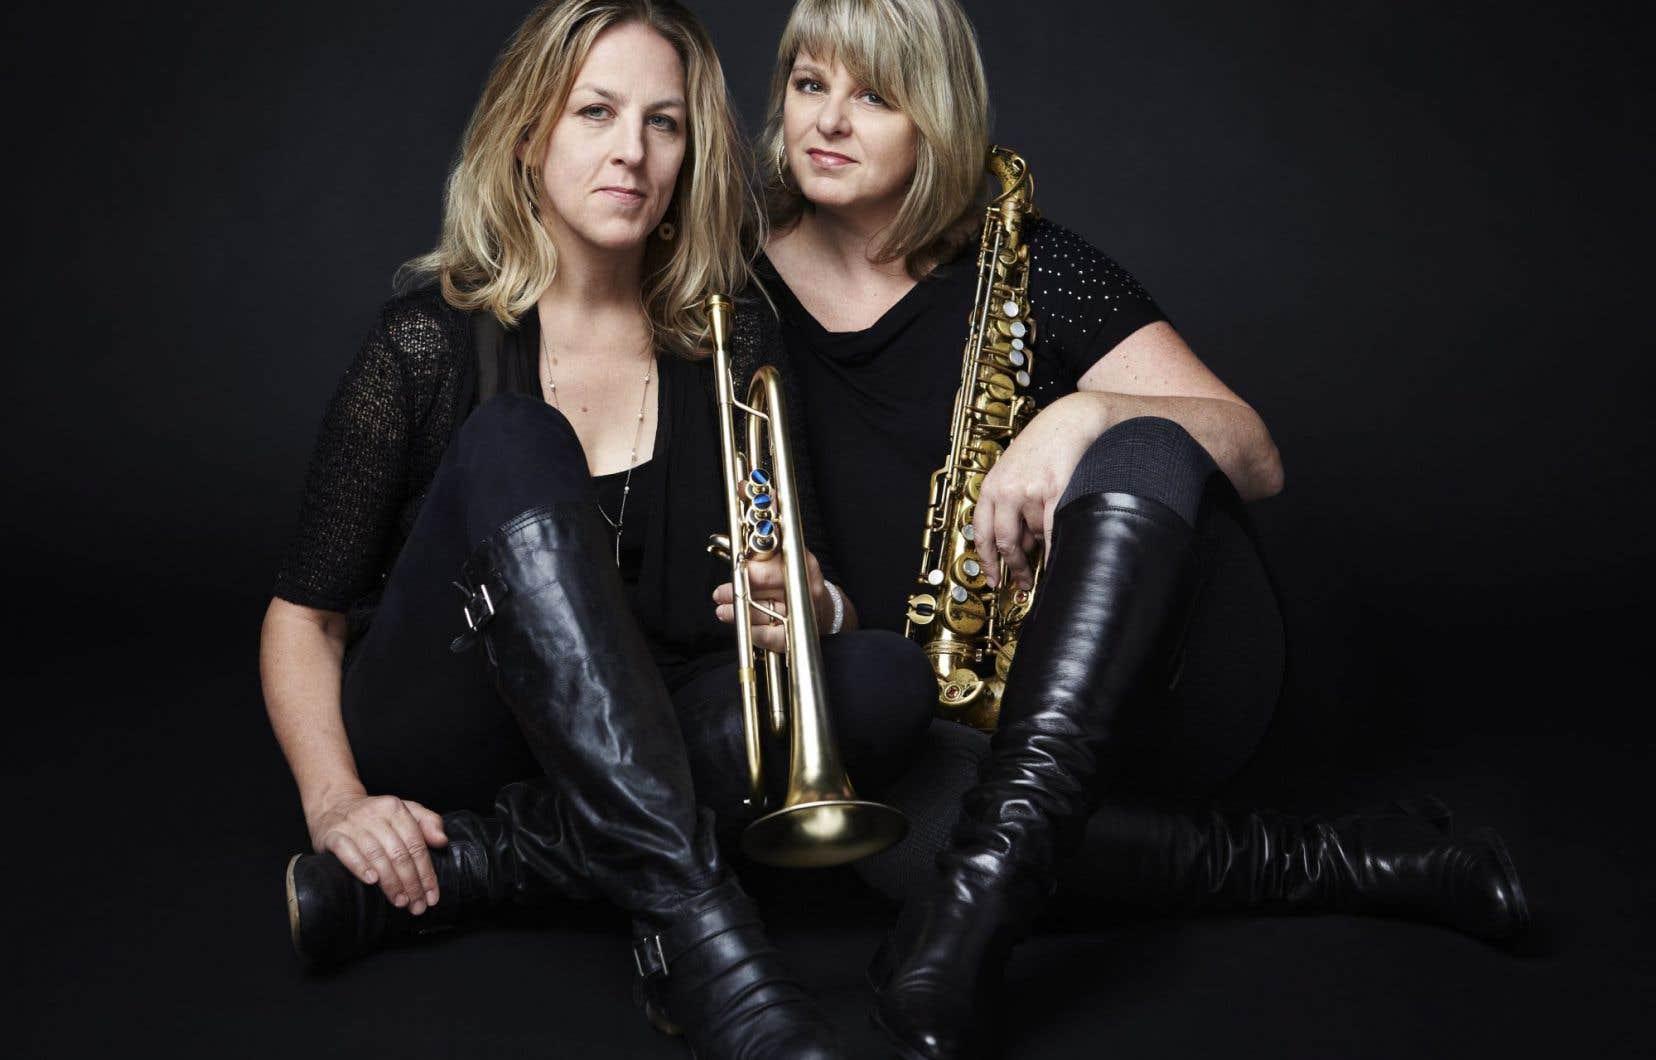 Les soeurs Christine et Ingrid Jensen